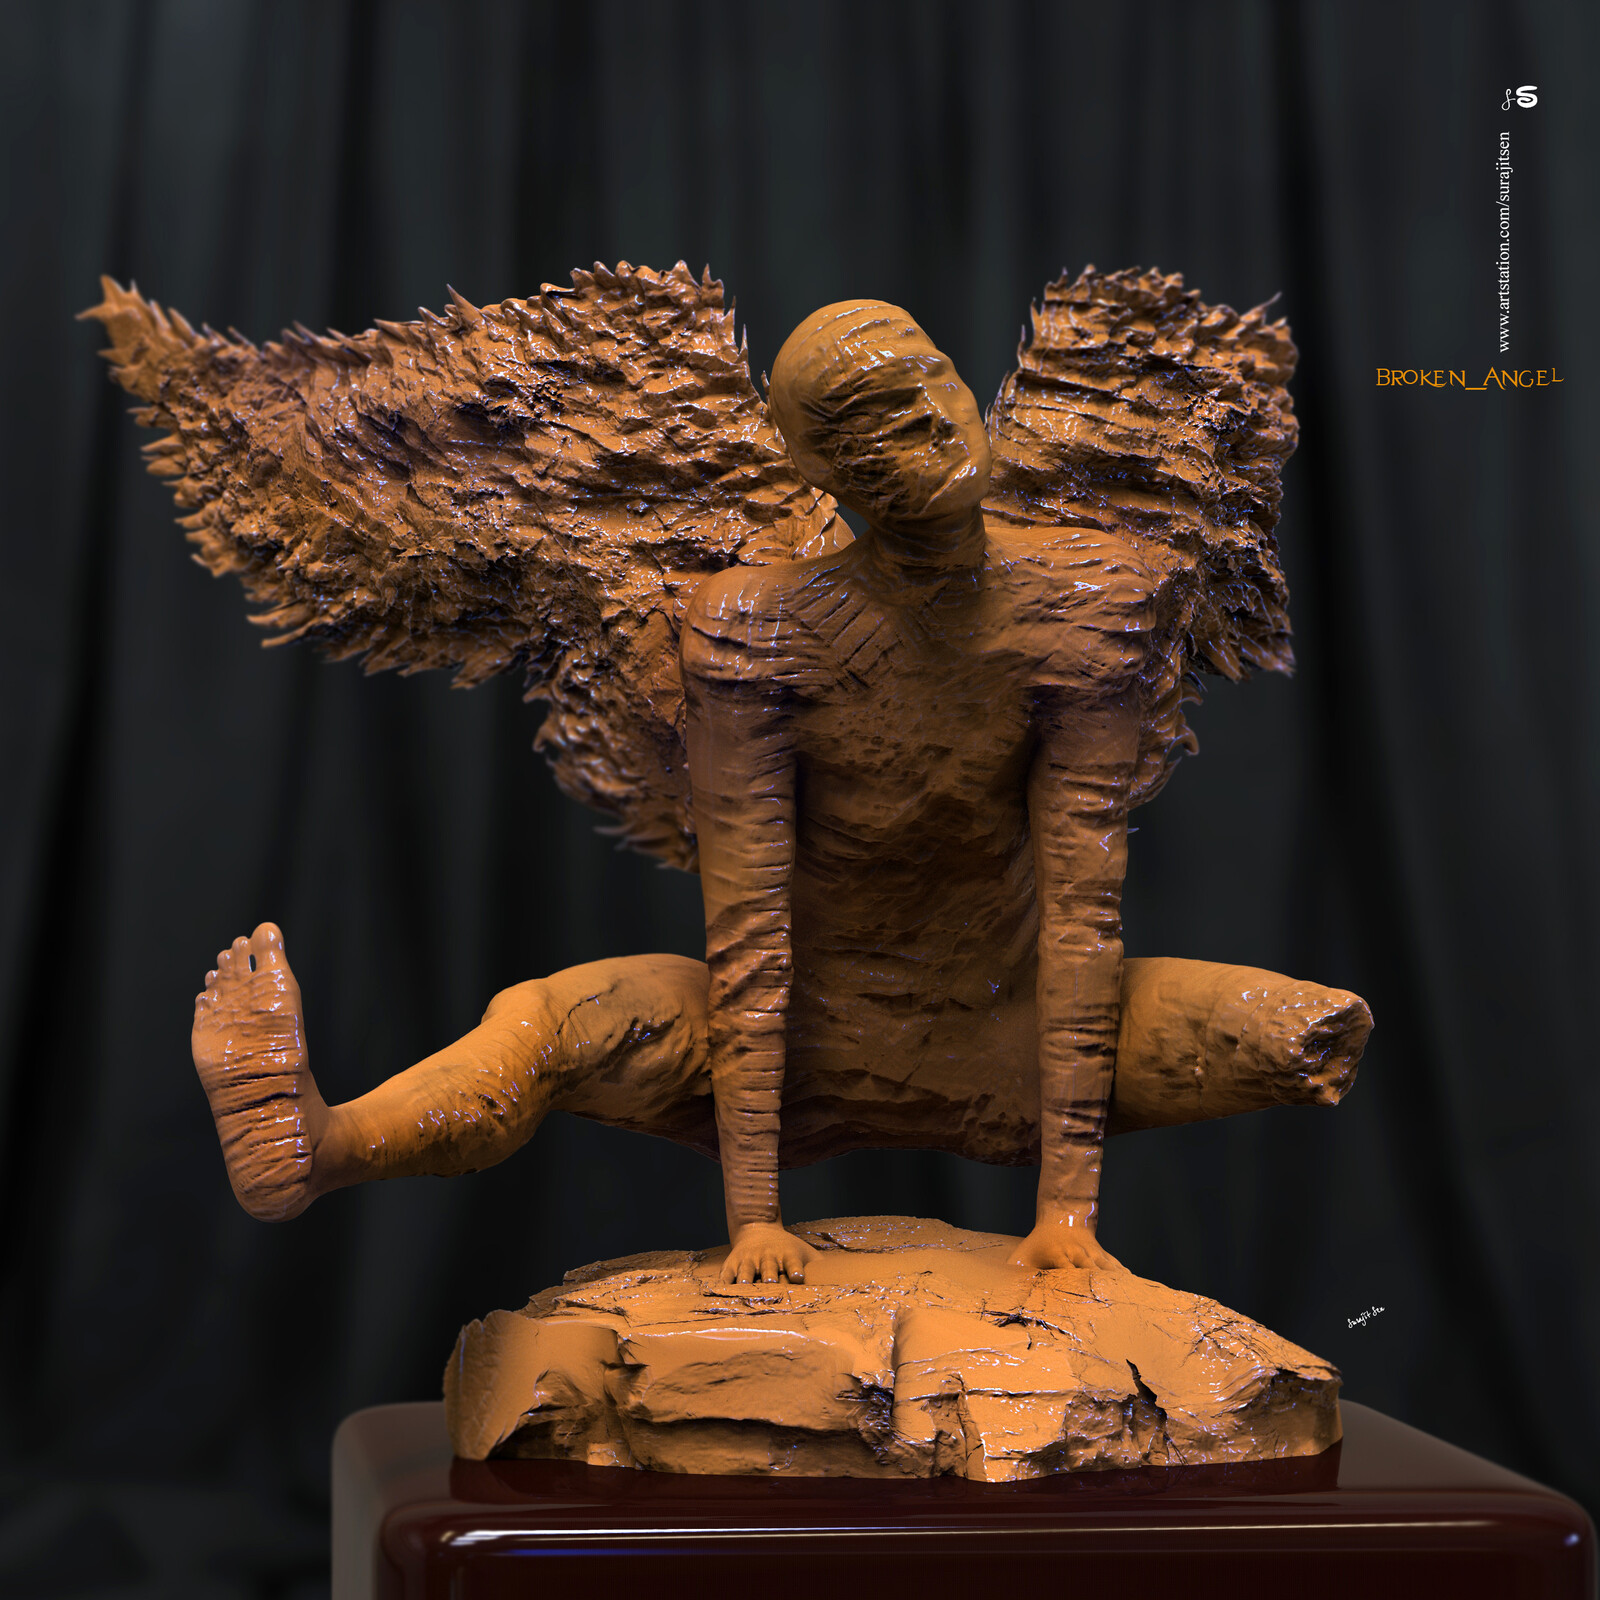 #brokenangel Digital Sculpture. My thoughts....